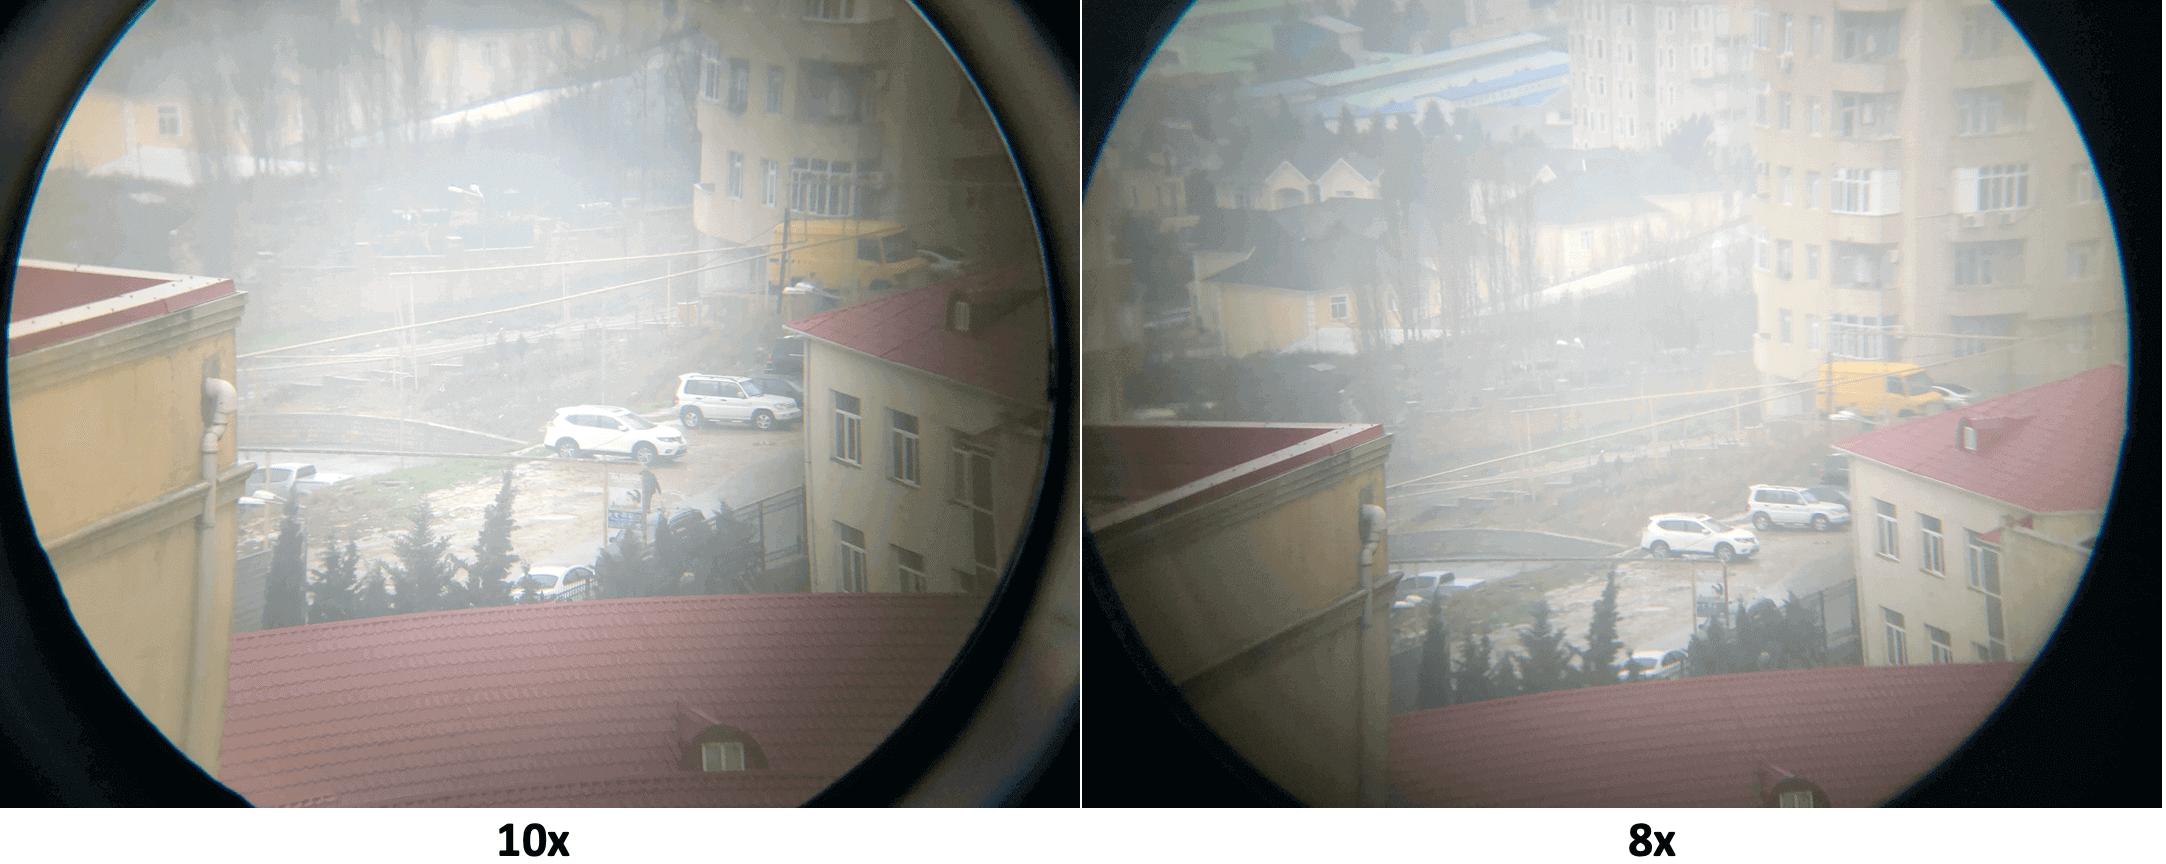 magnification 8x-vs -10x